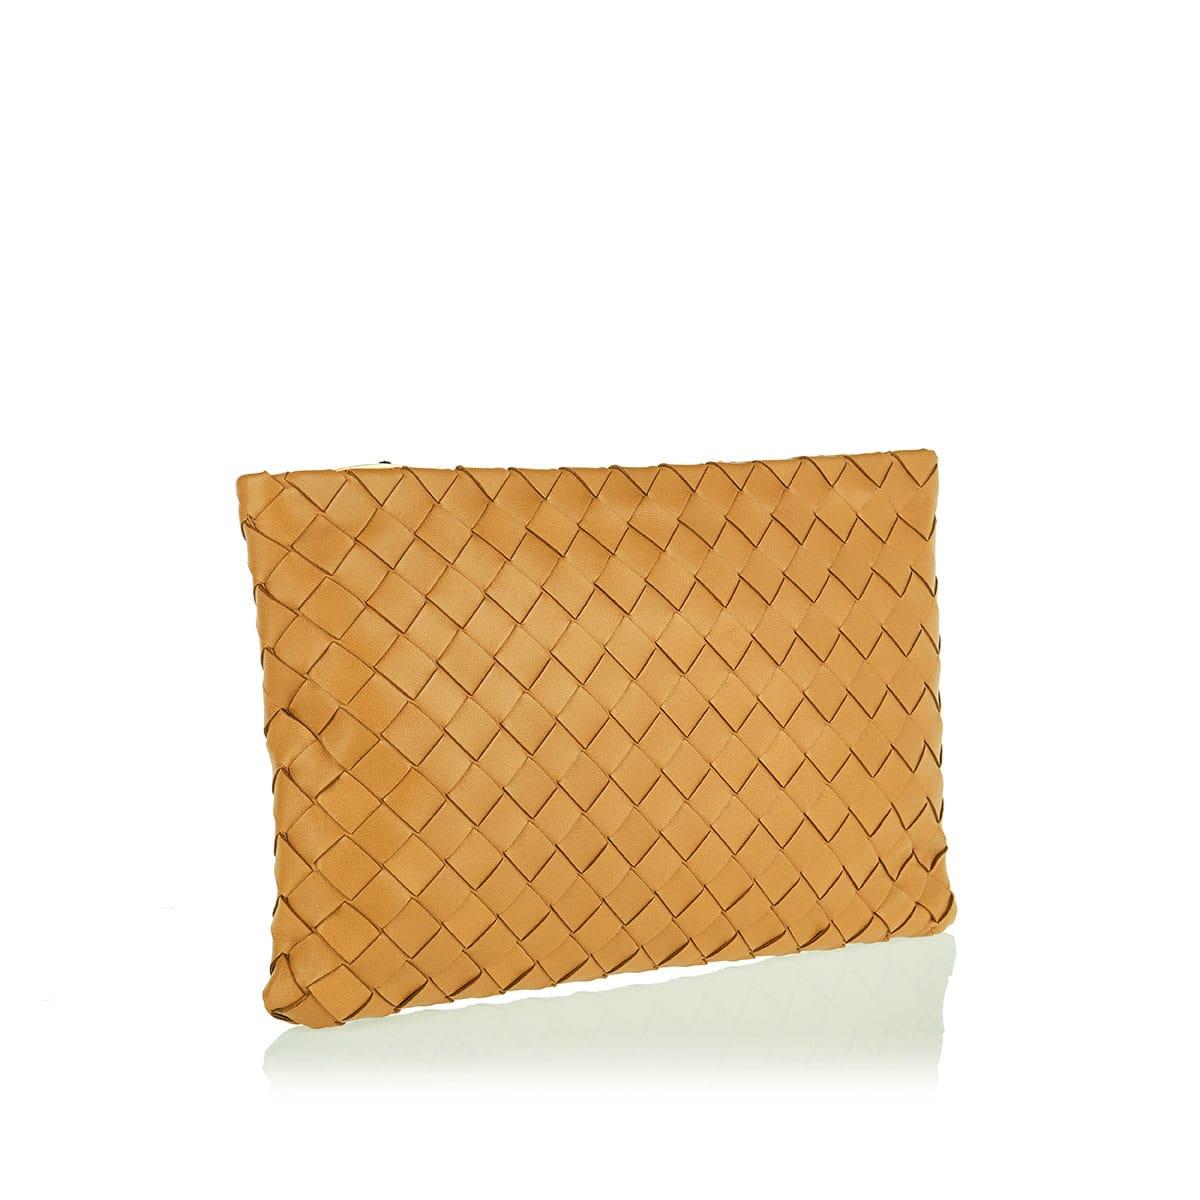 Large Intrecciato leather pouch